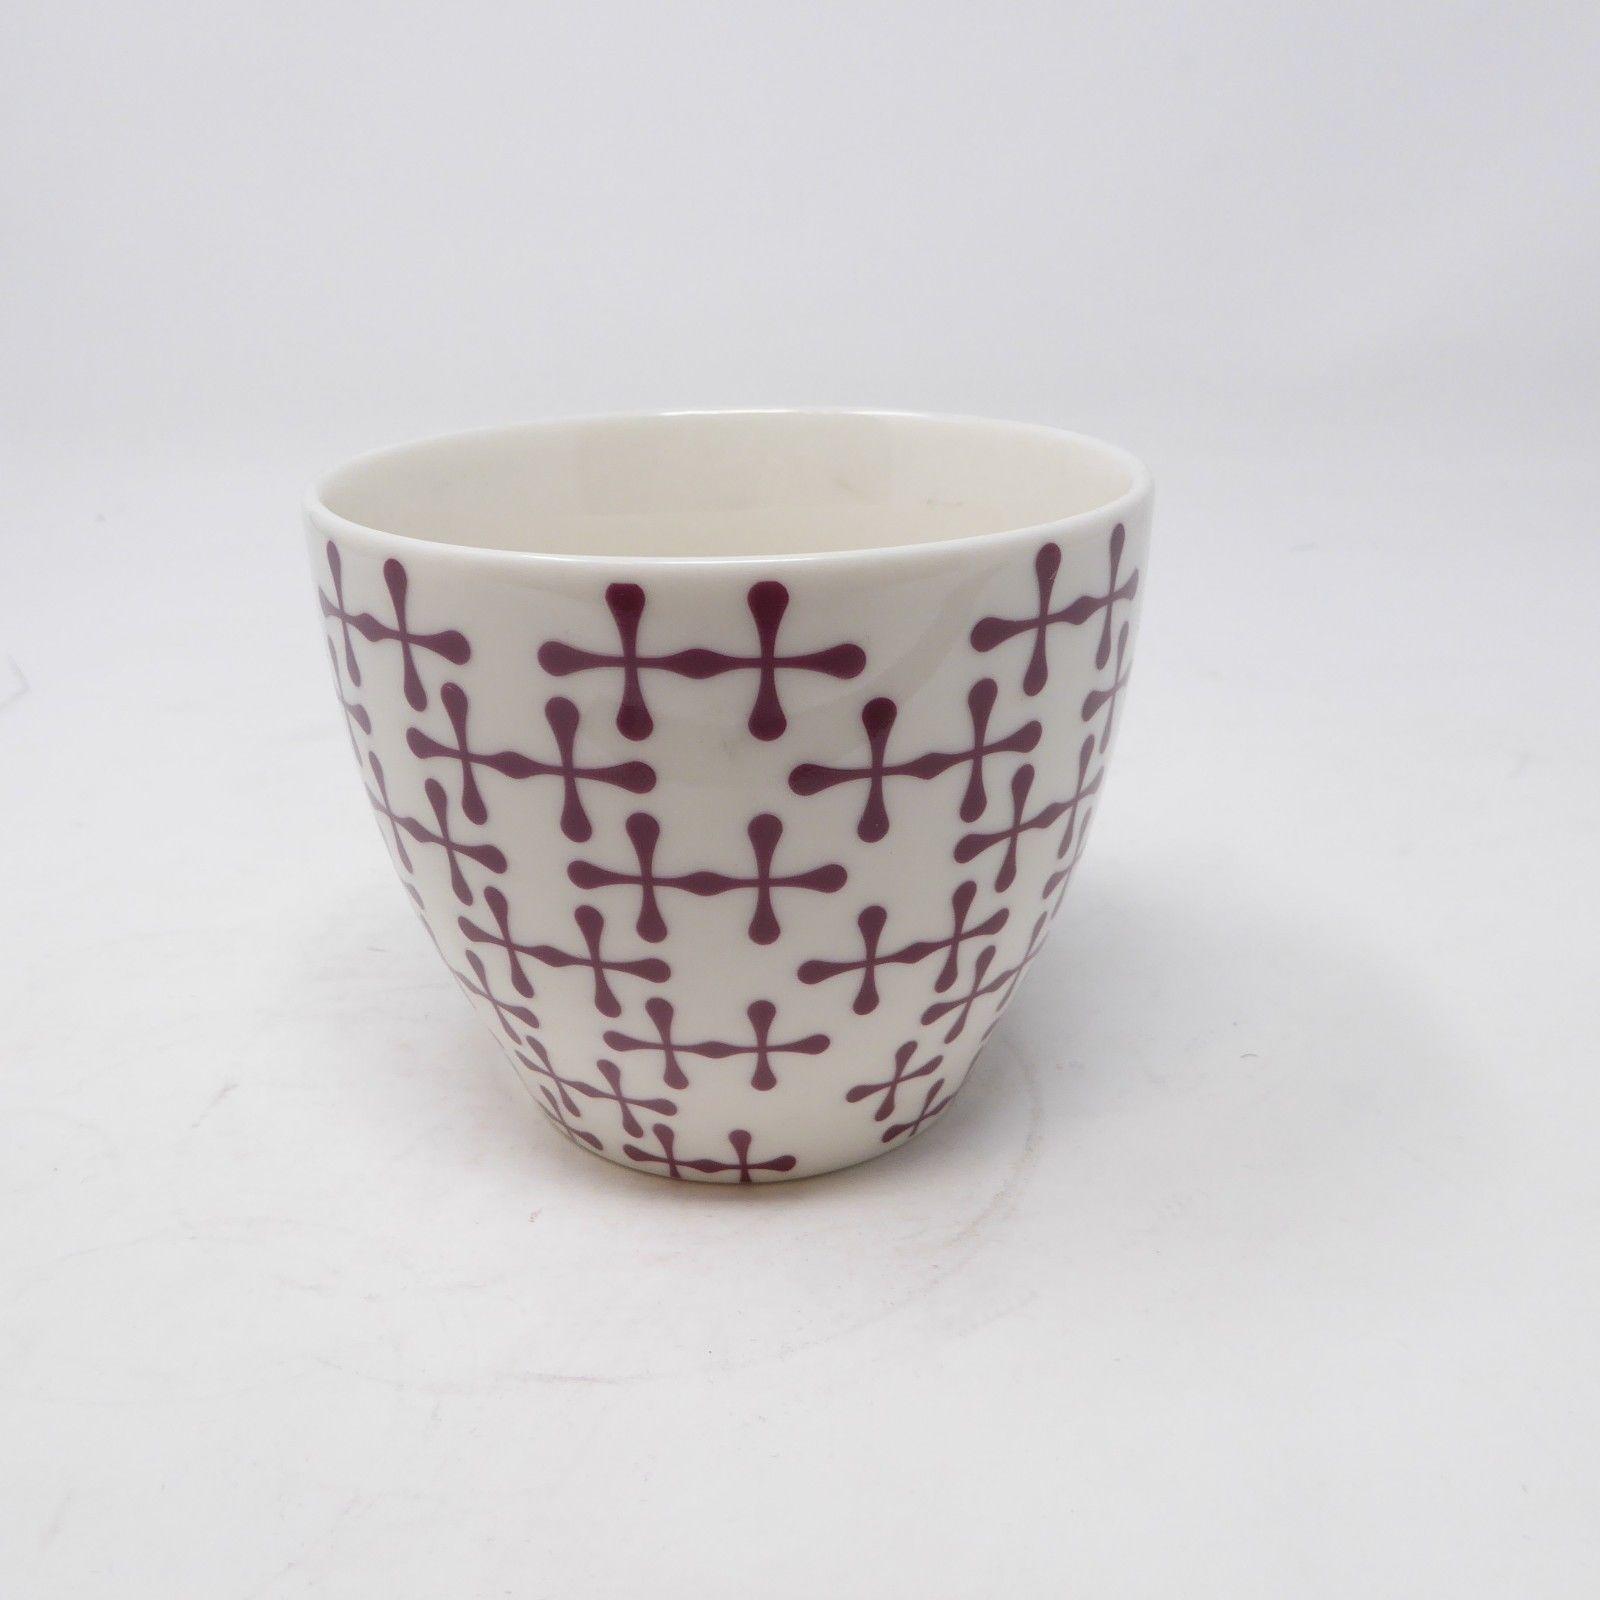 5f996e6eb21 Starbucks Mug New Bone China Nouvelle Porcelaine 2010 Cross of Red & White  Base